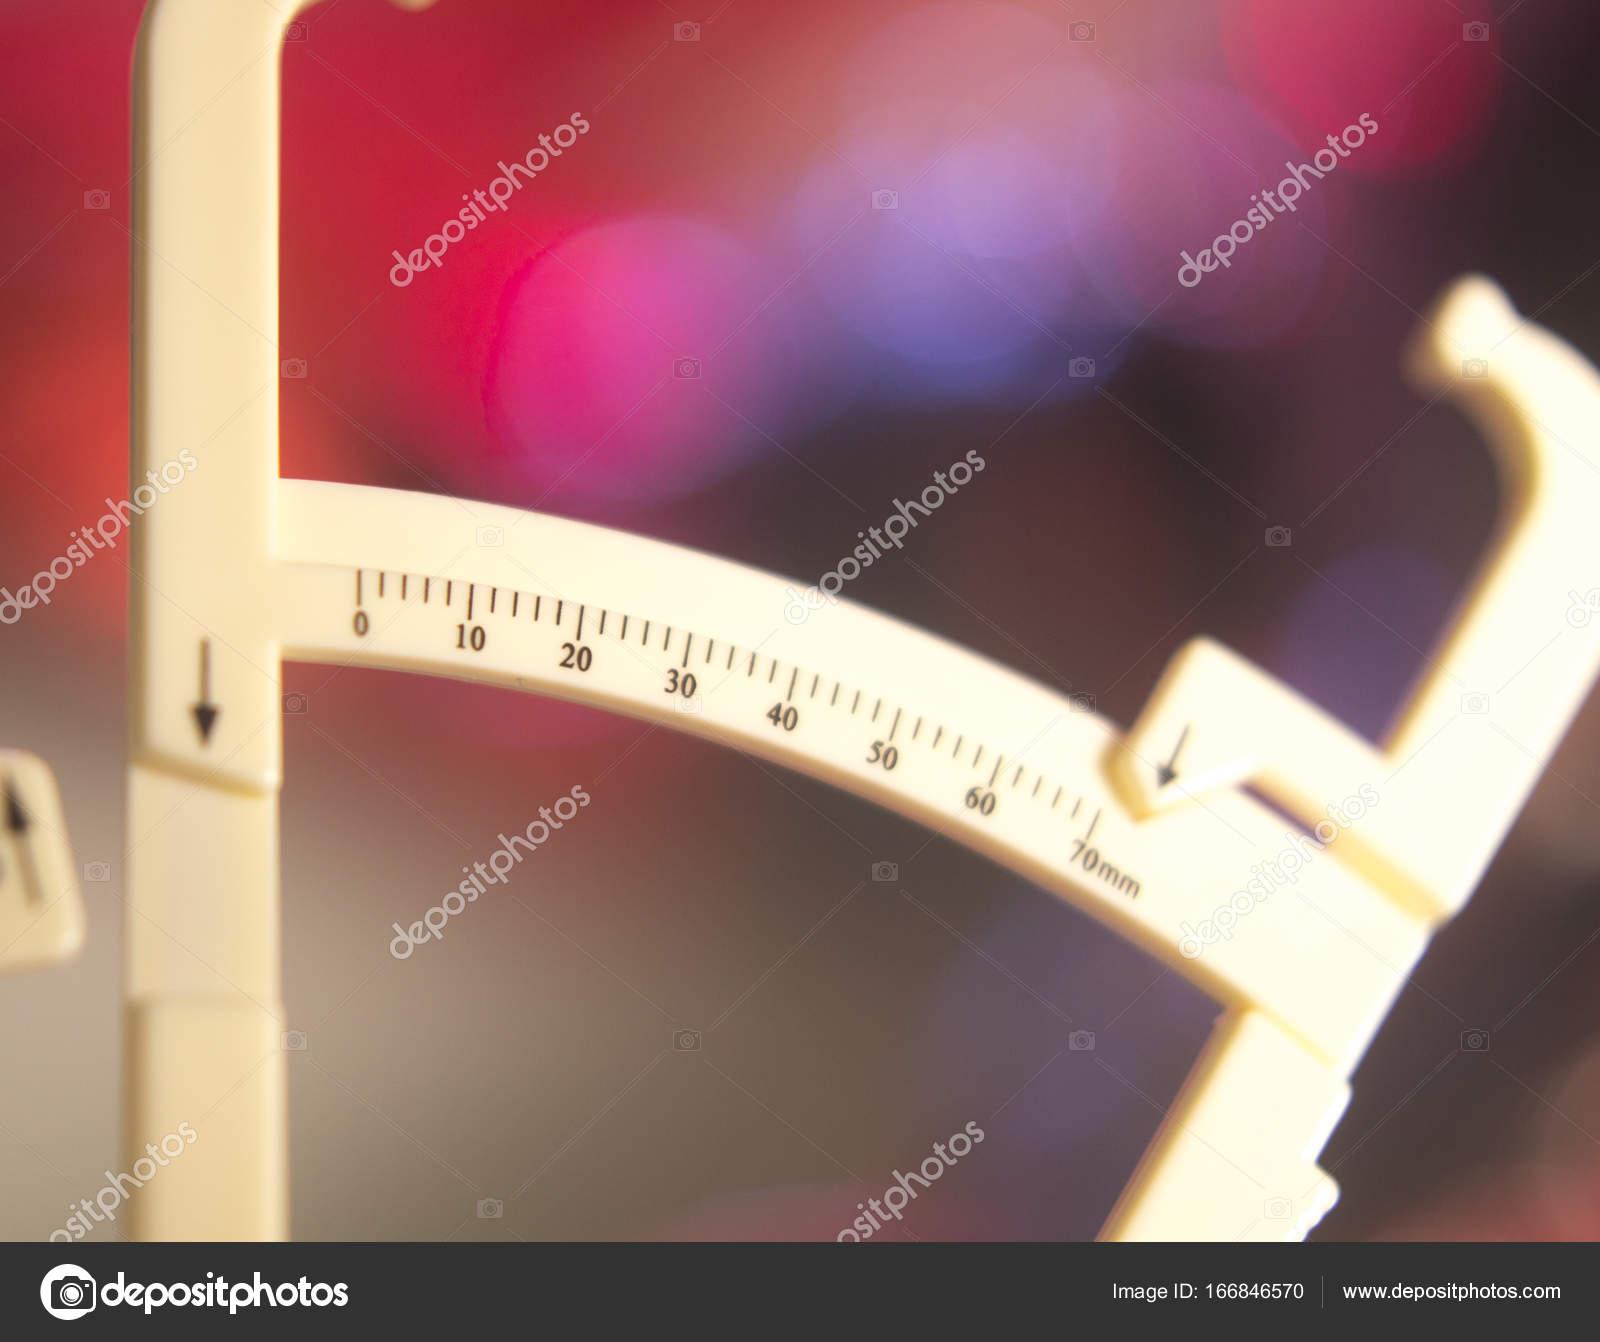 Dieta perdida de grasa corporal